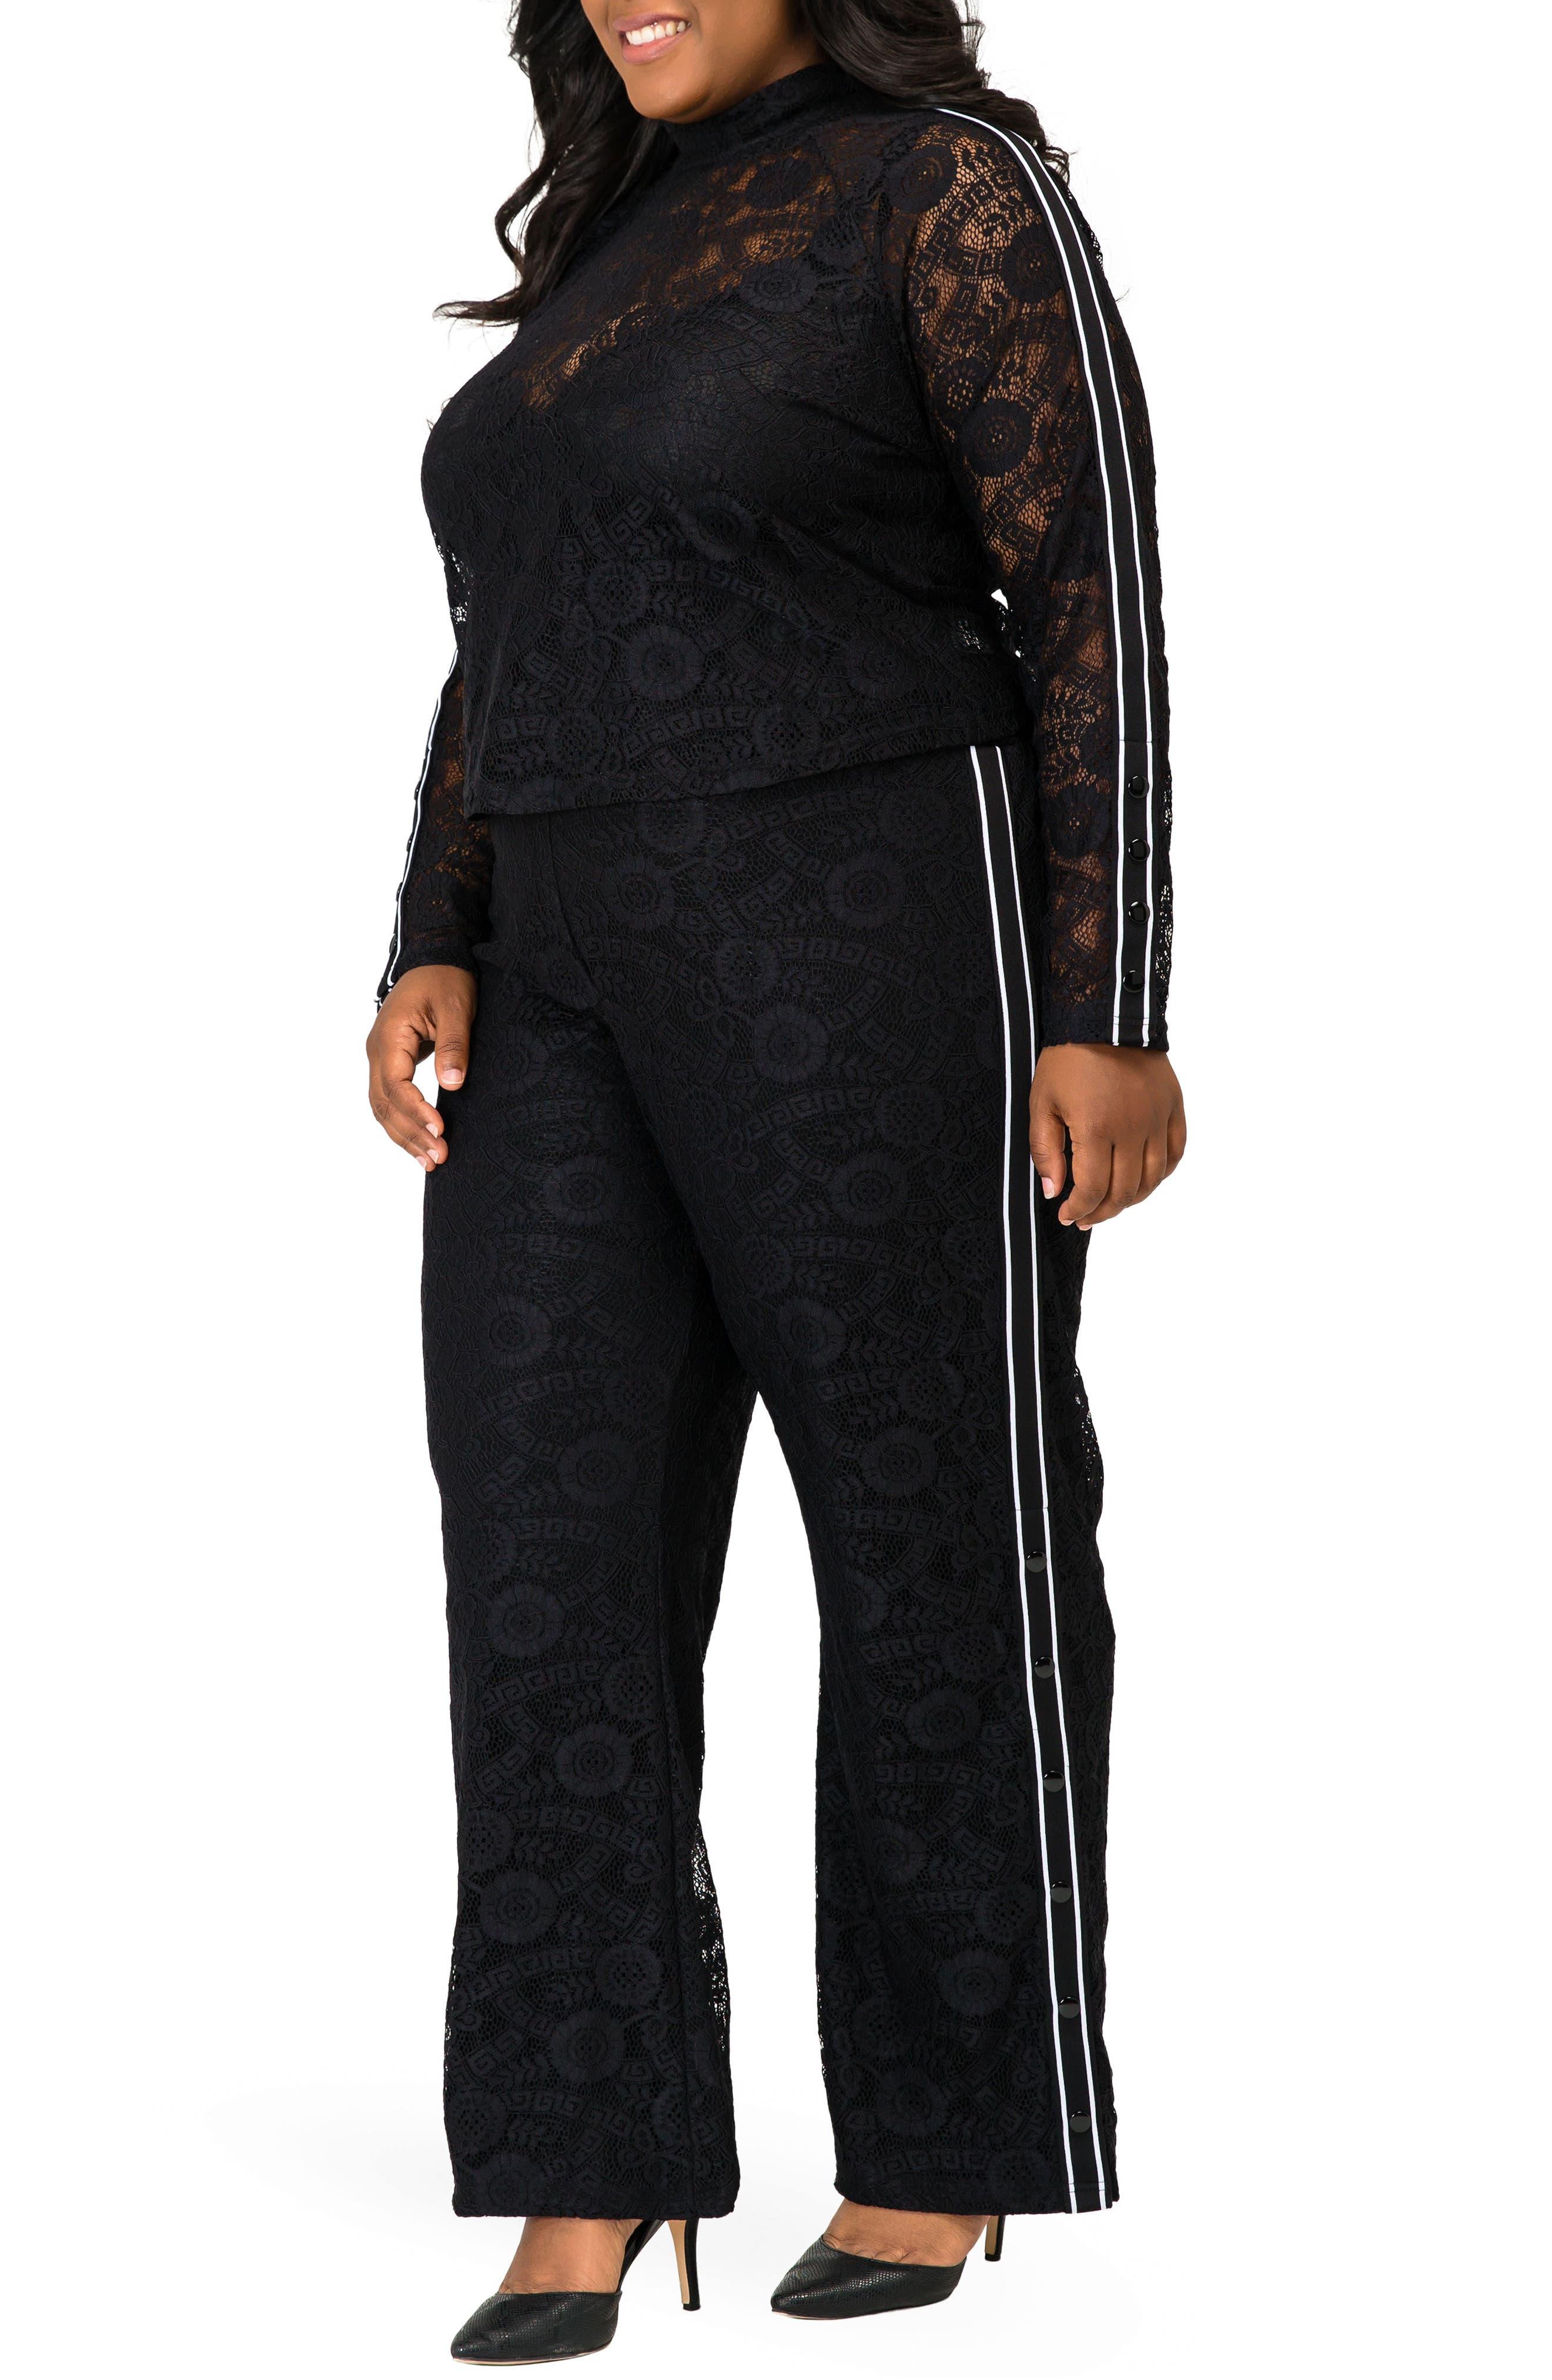 POETIC JUSTICE, Cornella High Rise Lace Knit Track Pants, Alternate thumbnail 5, color, BLACK